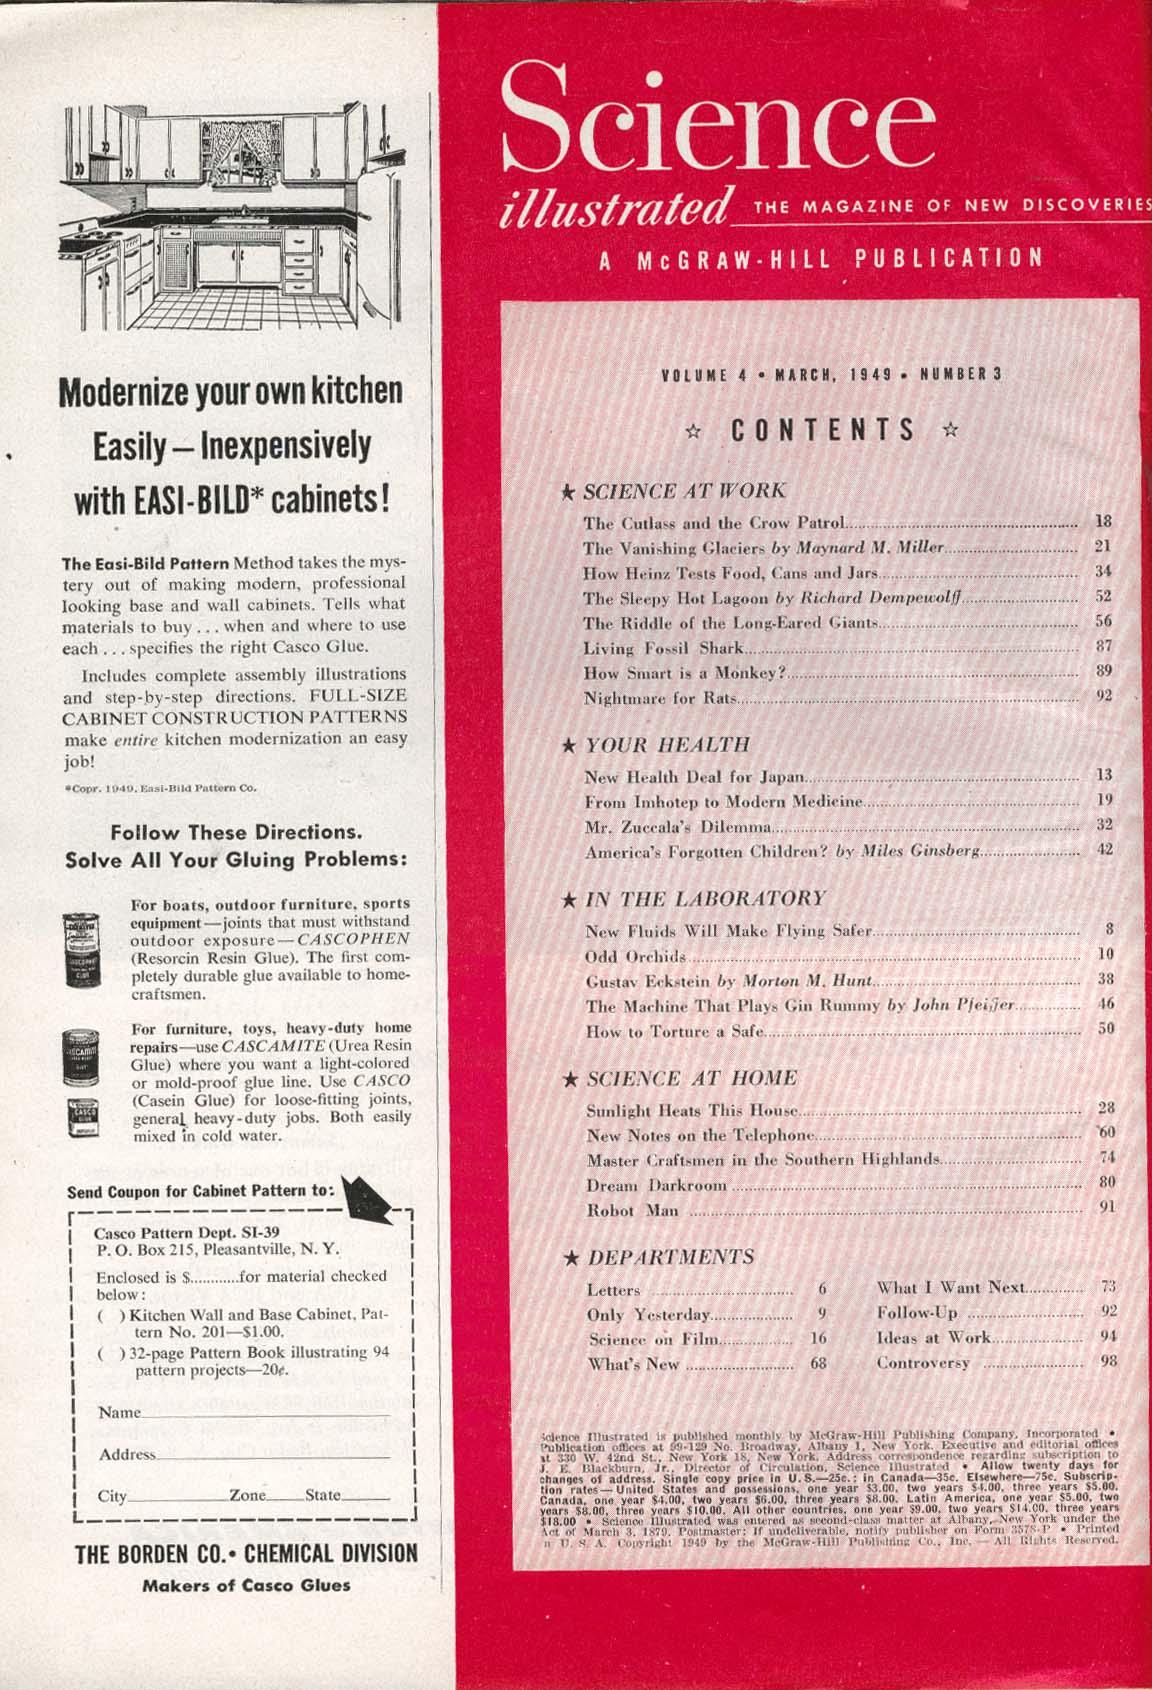 SCIENCE ILLUSTRATED Ice Cap Crash Heinz Foods 3 1949